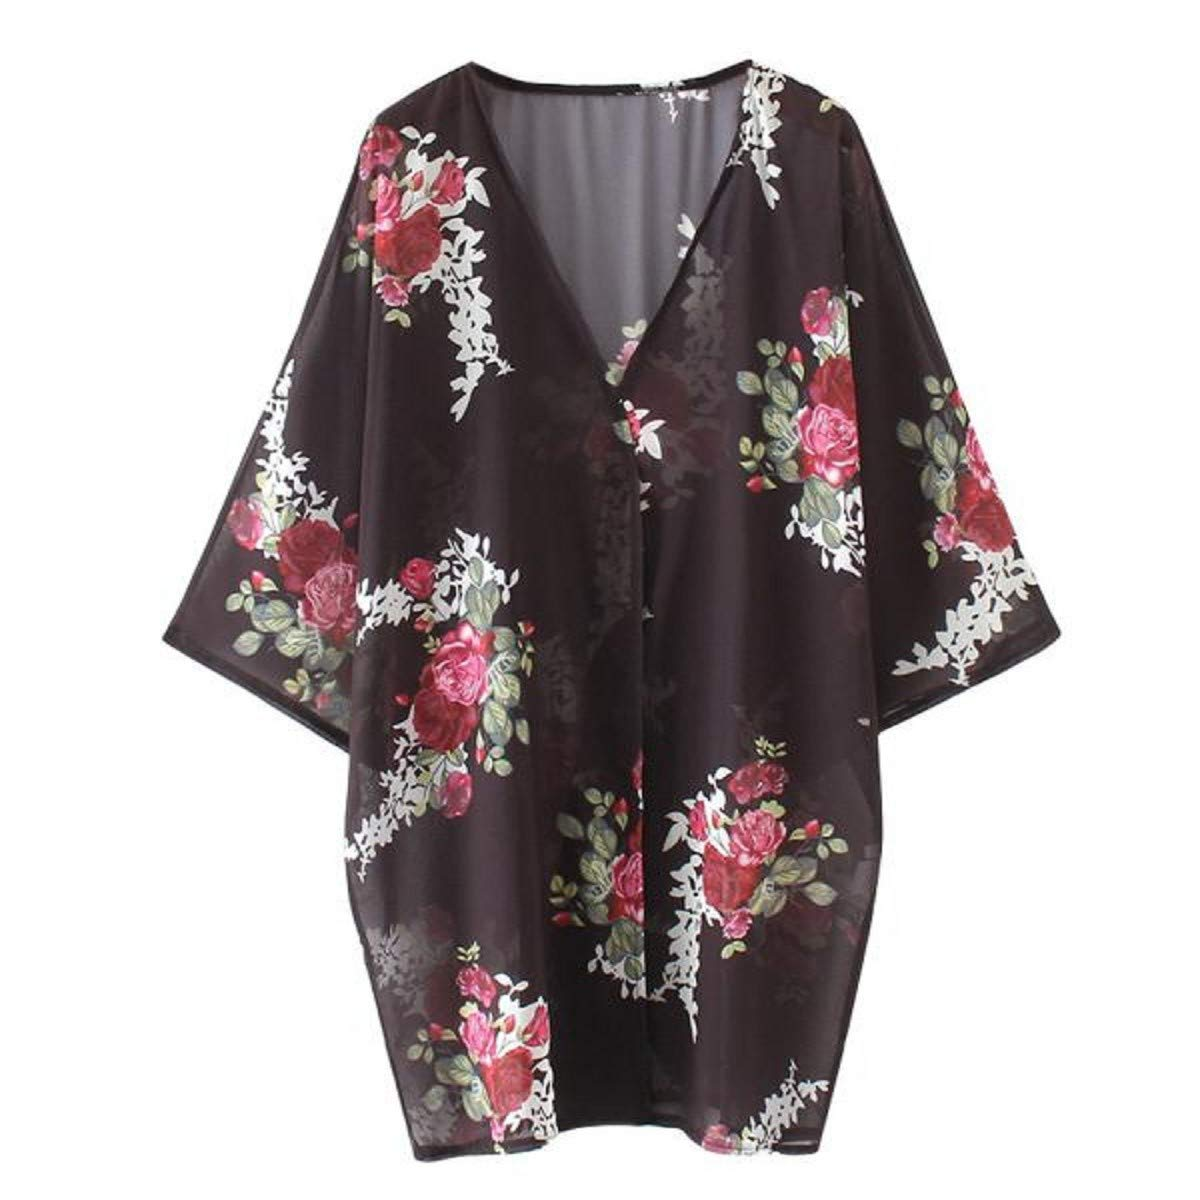 OTINICE Women's Chiffon Kimono Cardigans Floral Puff Sleeve Casual Loose Swimwear Cover ups Black by OTINICE (Image #2)